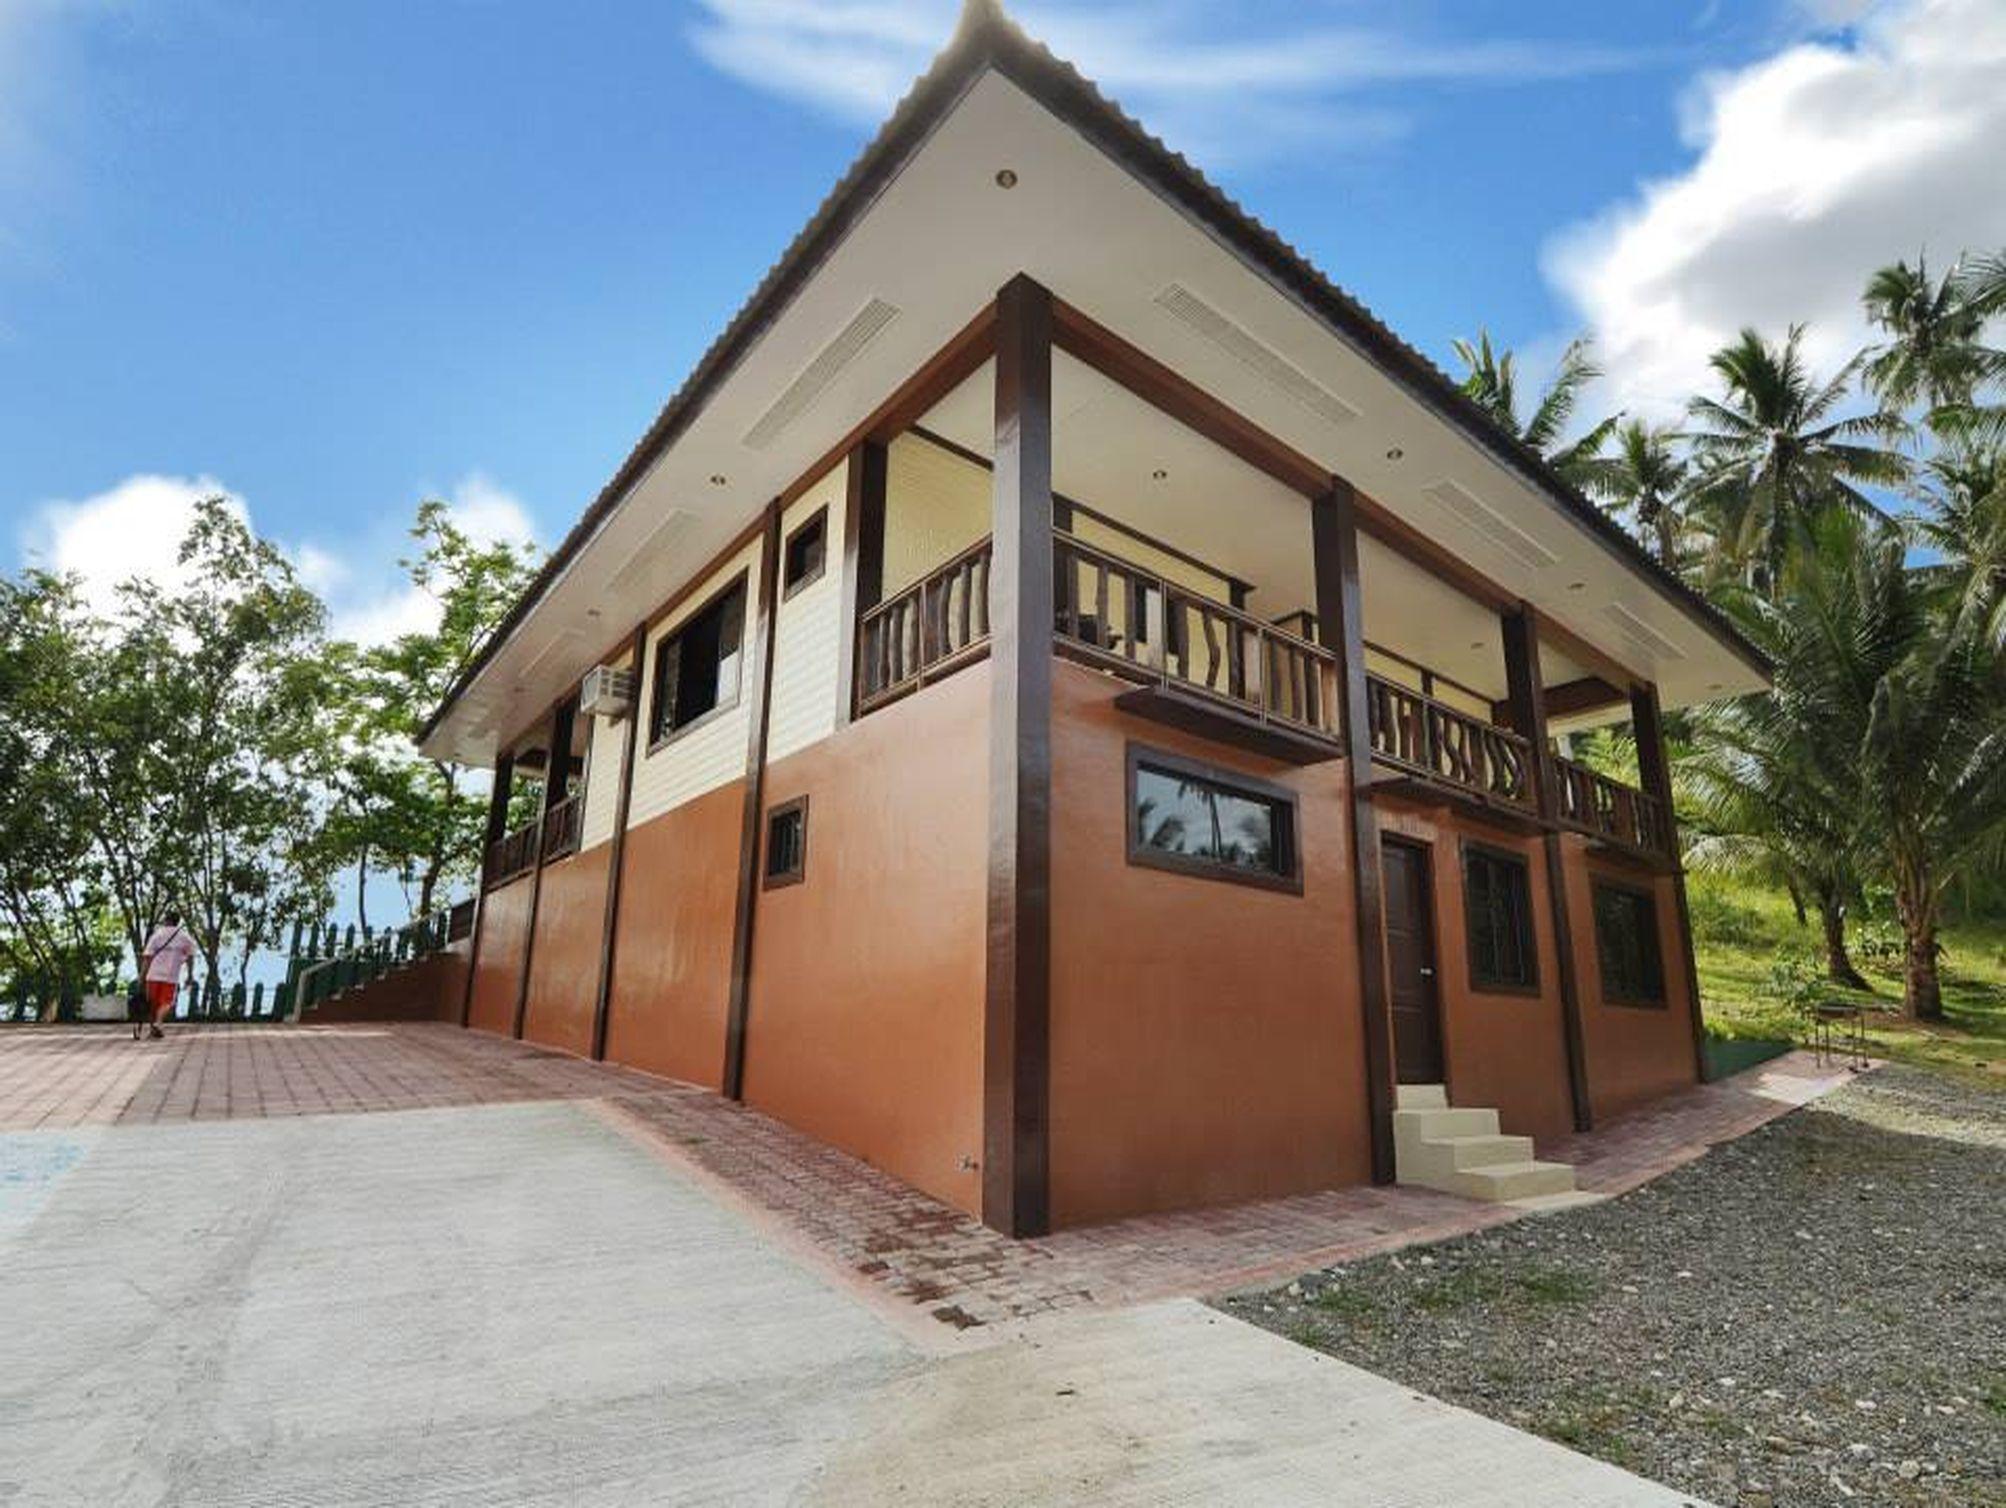 Isla jardin del mar resort general santos philippines for Apart hotel jardin del mar